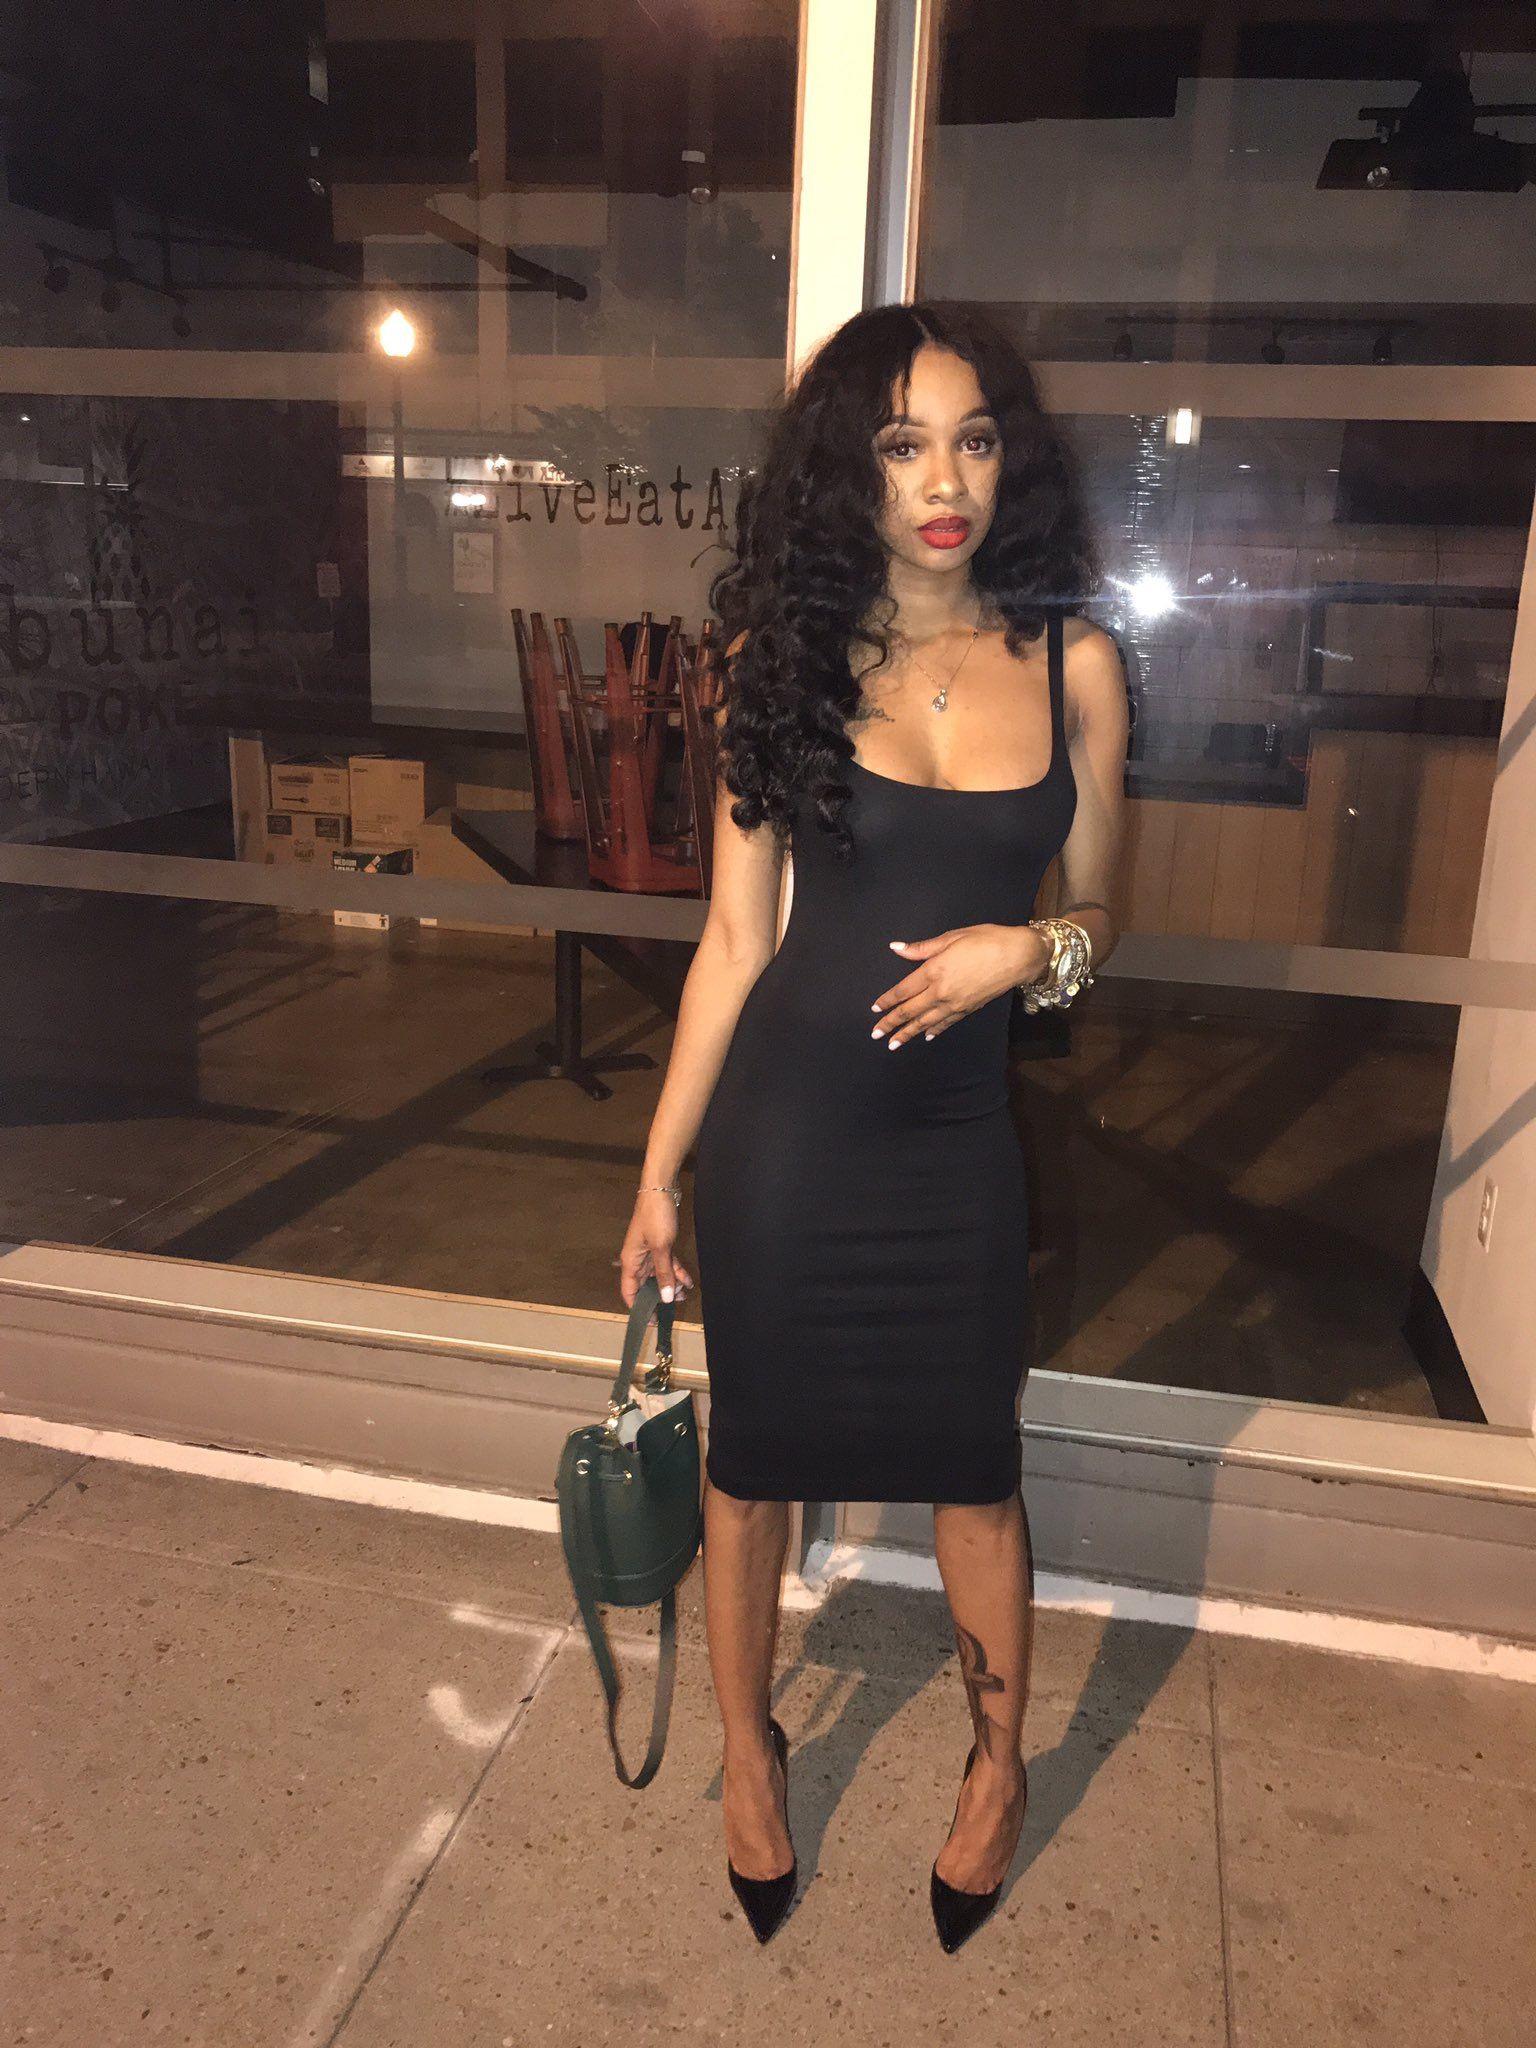 Pin By Jada On Date Night Fashion Black Girl Outfits Black Women Fashion [ 2048 x 1536 Pixel ]